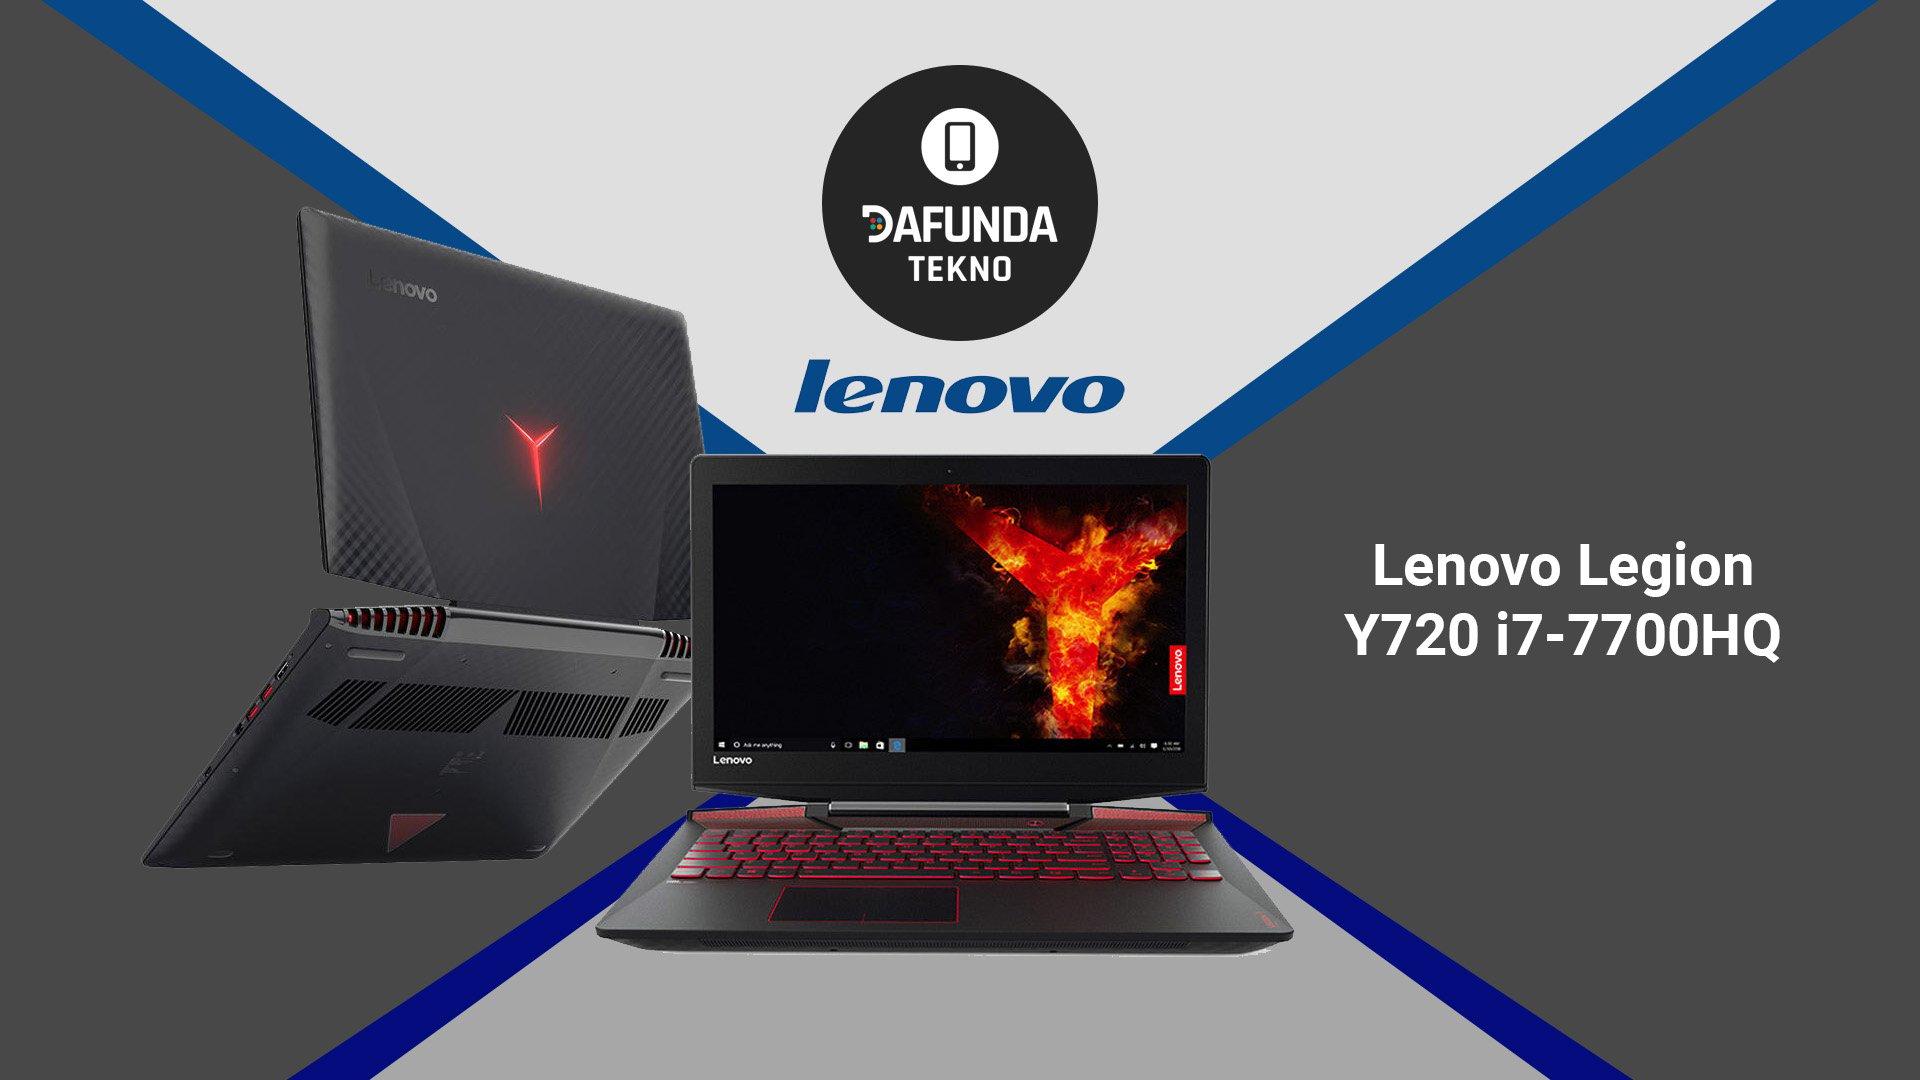 Lenovo Legion Y720 I7 7700hq